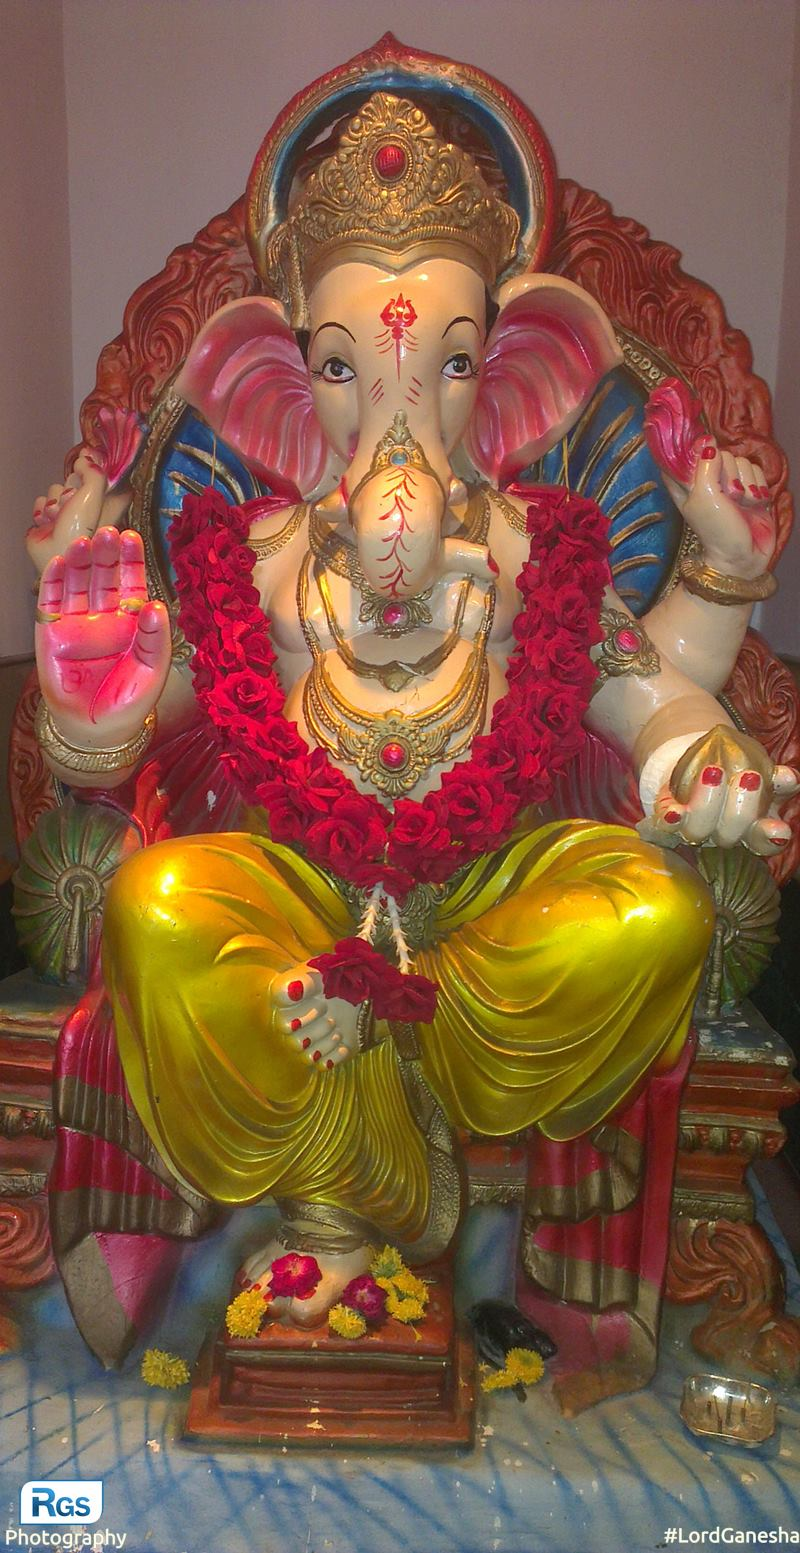 The Lord Ganesha